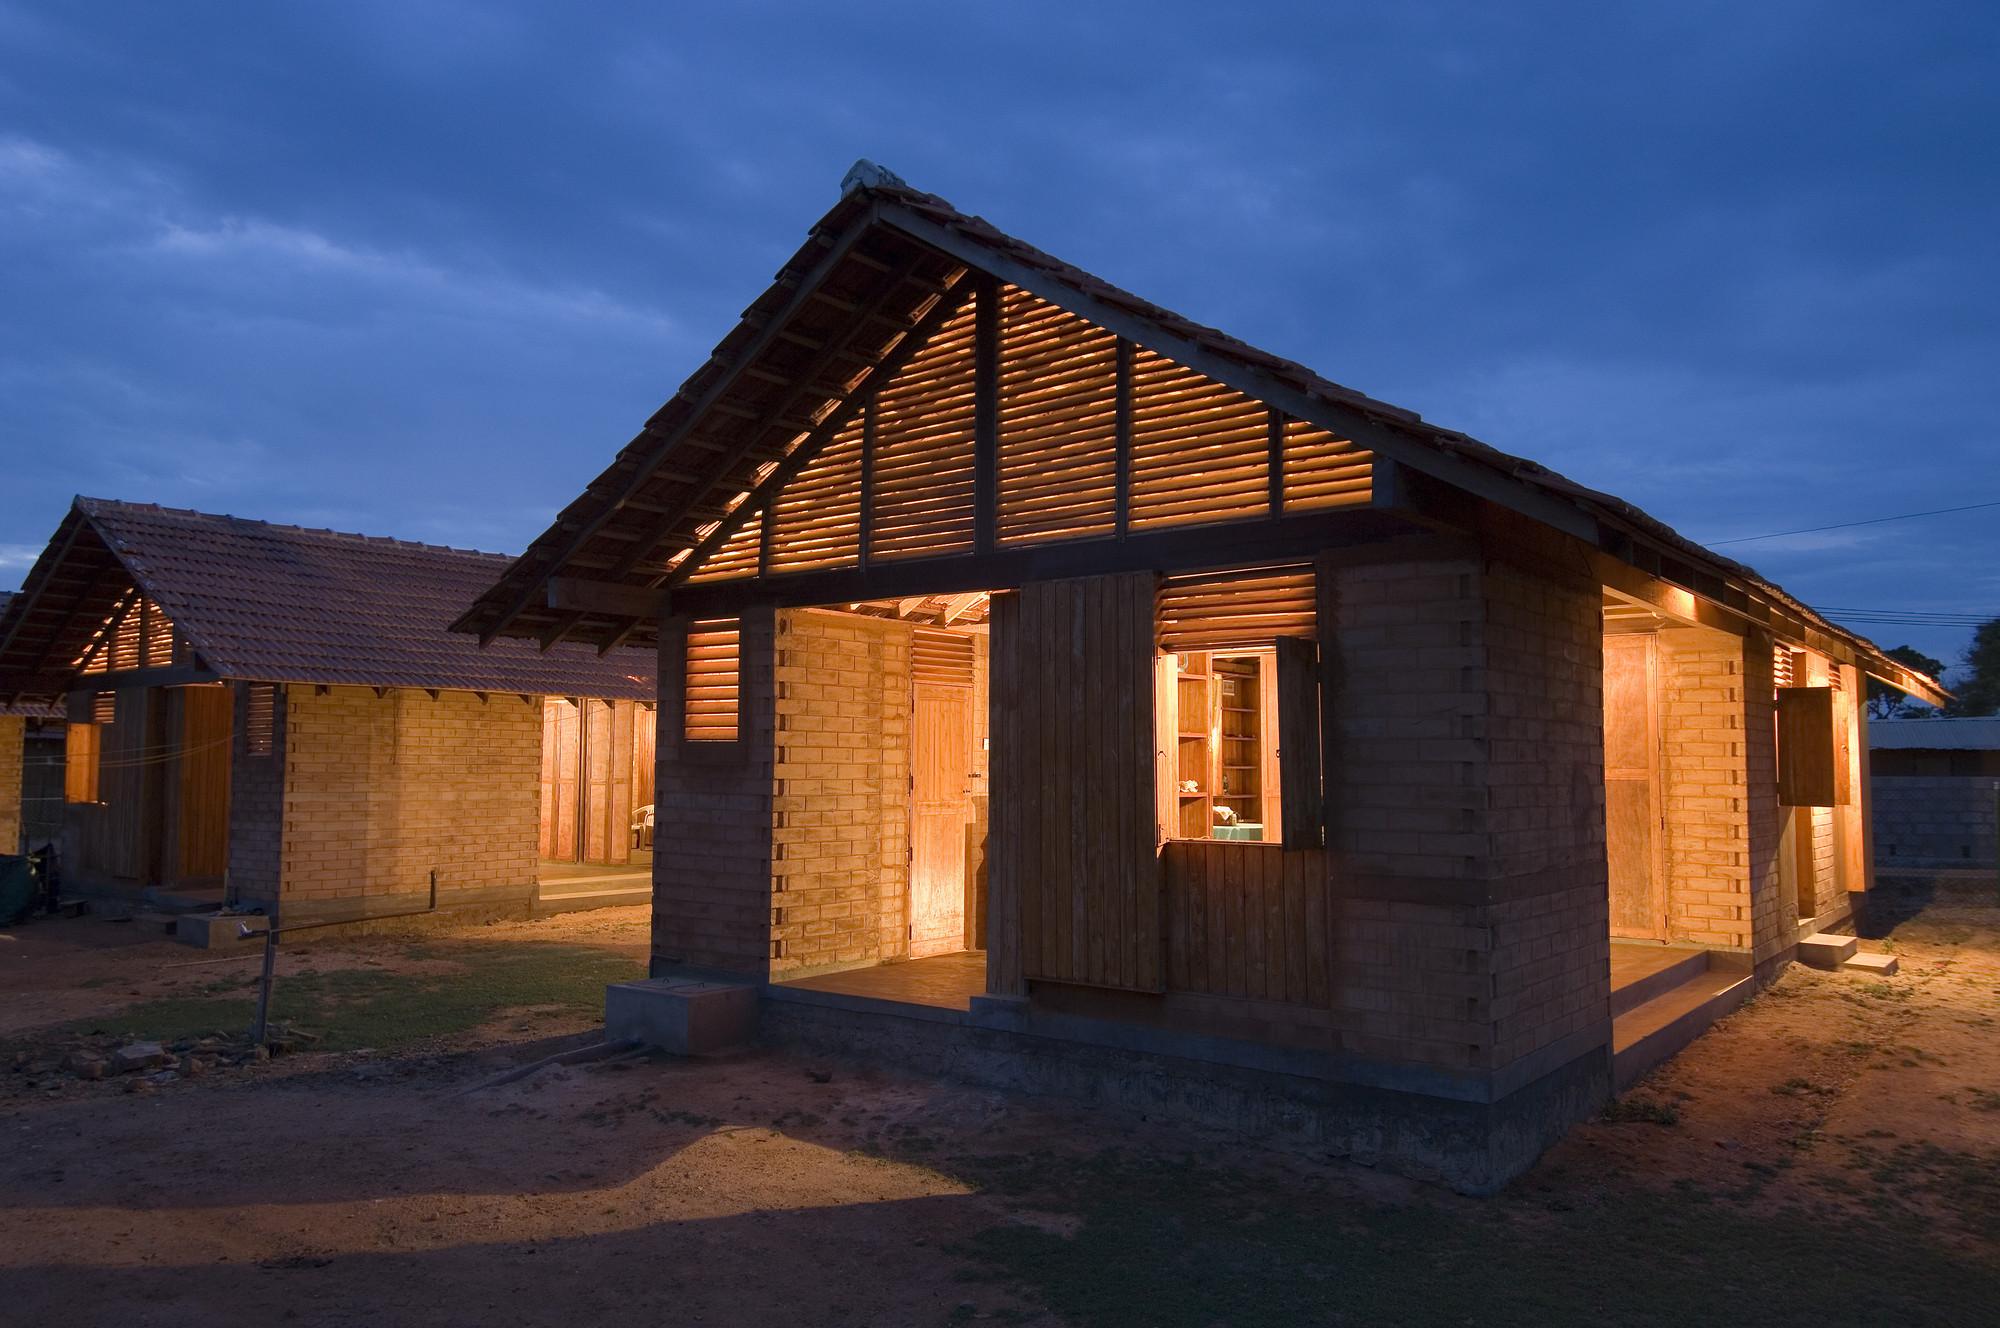 Shigeru ban to design up to 20000 new homes for refugees in kenya shigeru ban